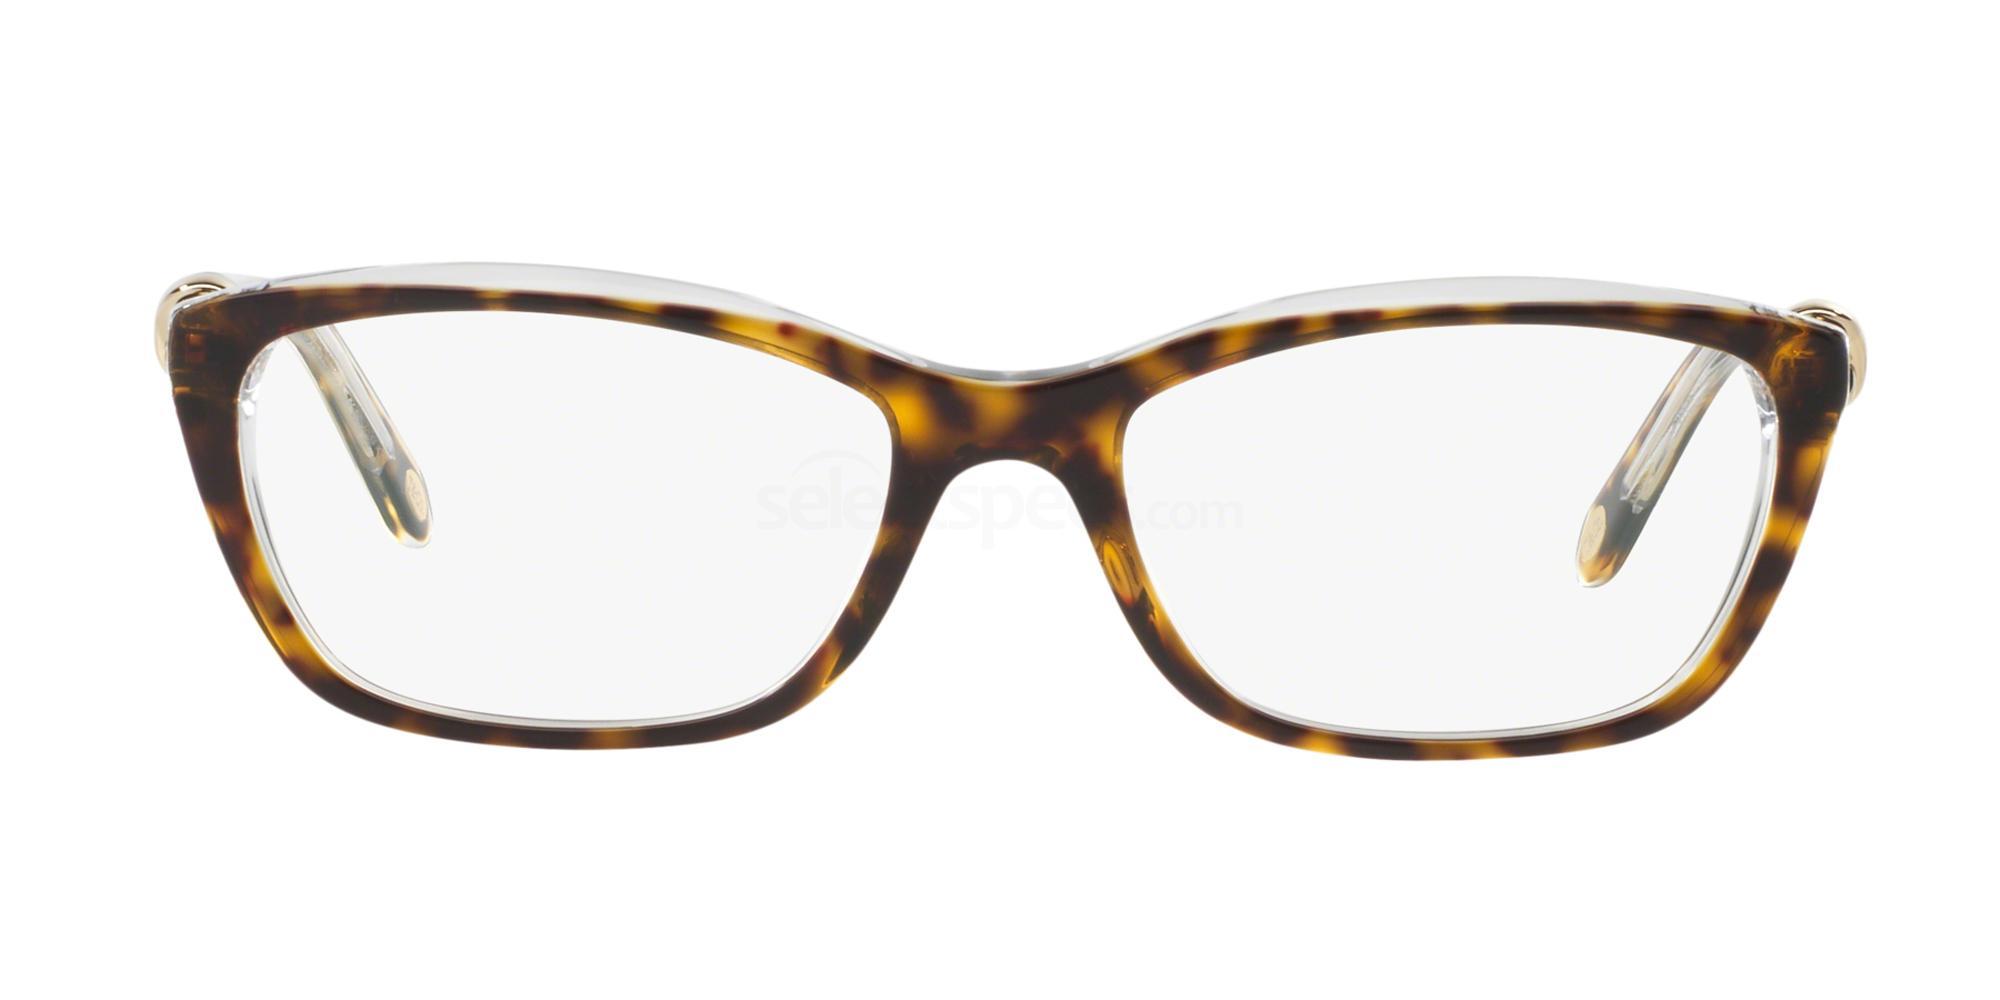 8155 TF2074 Glasses, Tiffany & Co.